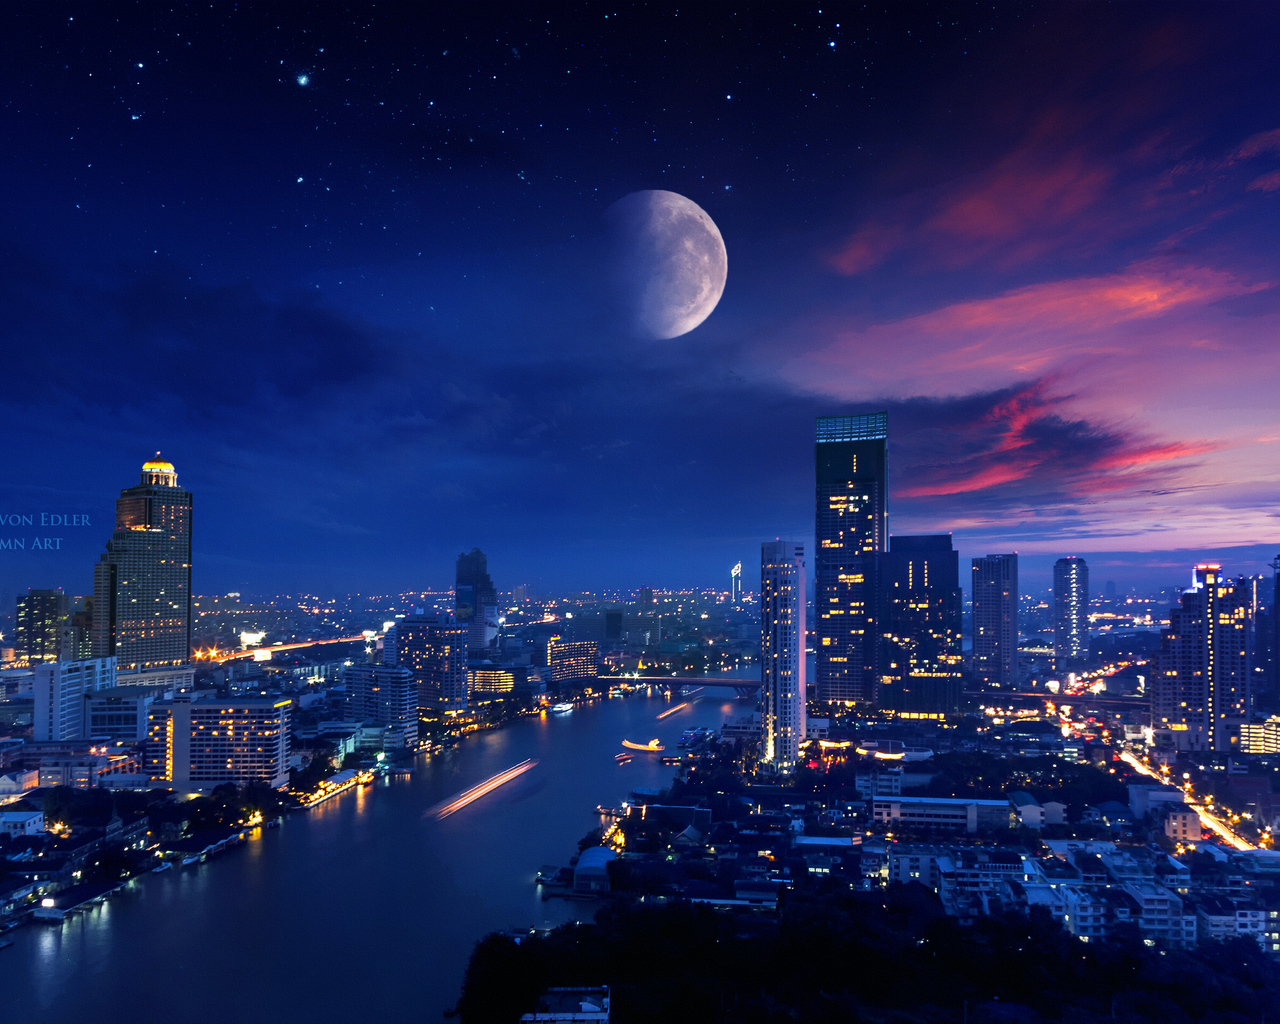 1280x1024 City Lights Moon Vibrant 4k 1280x1024 Resolution ...